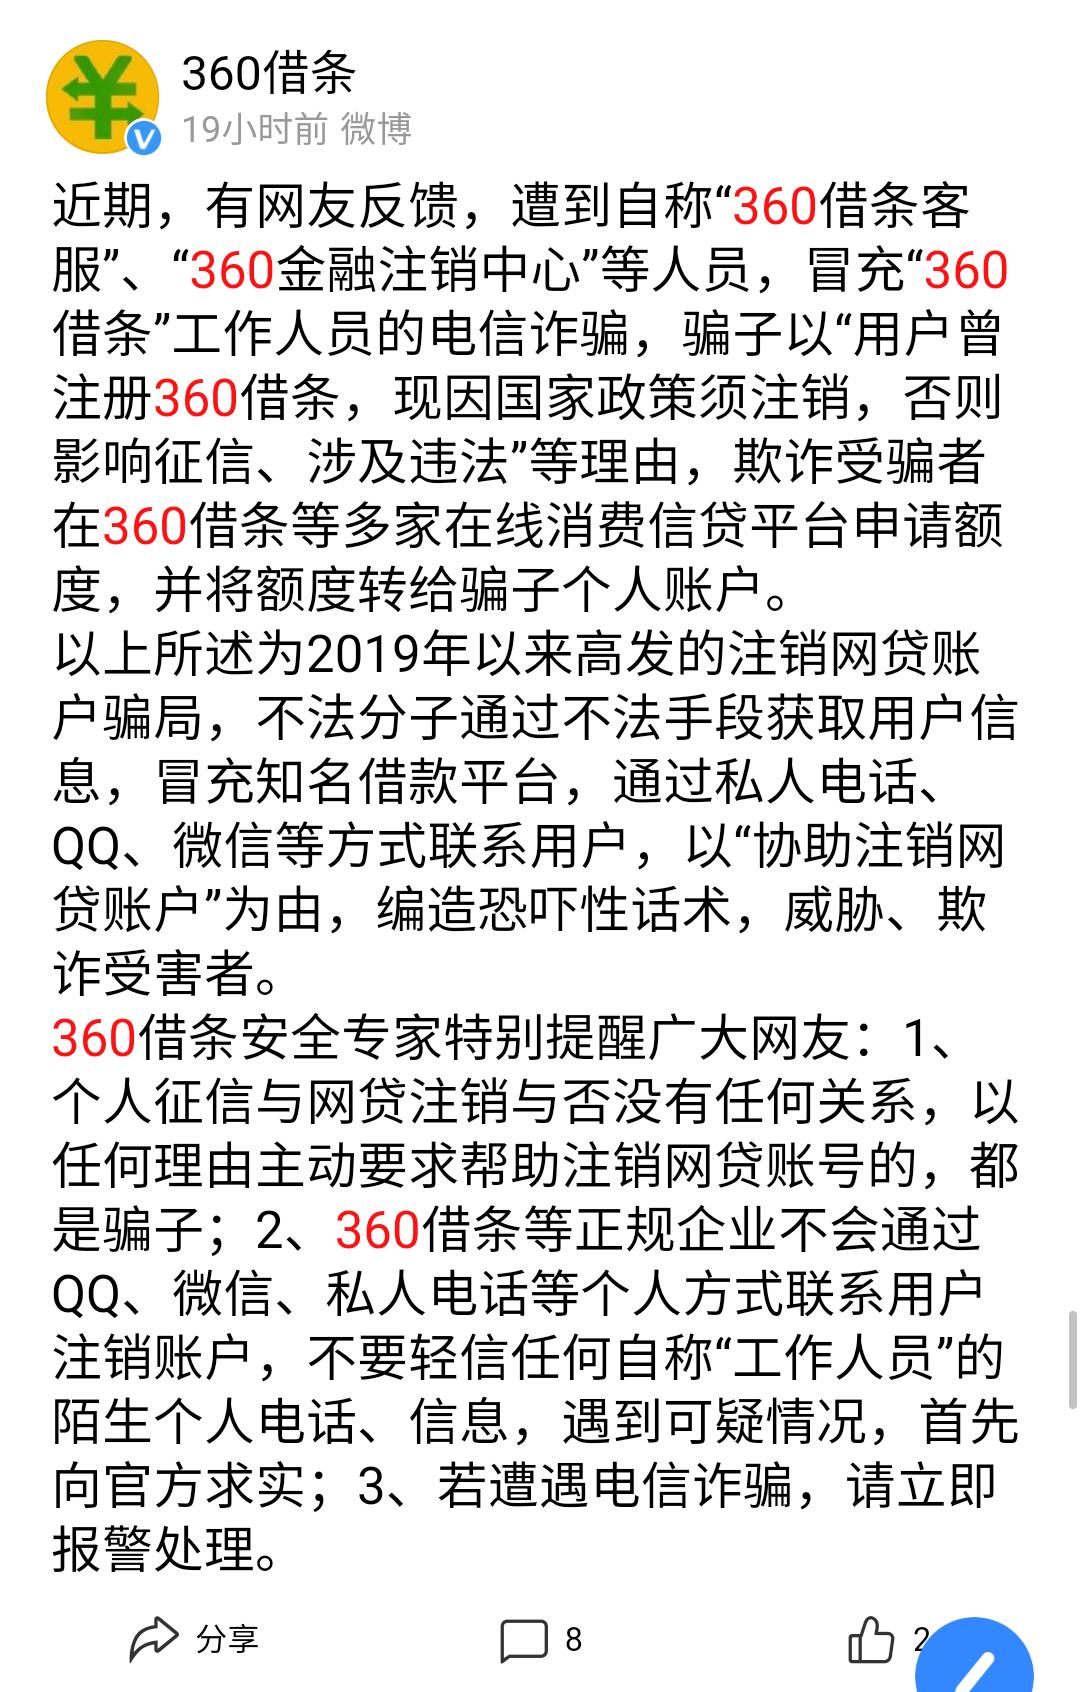 Screenshot_2020-04-14-13-59-00.png